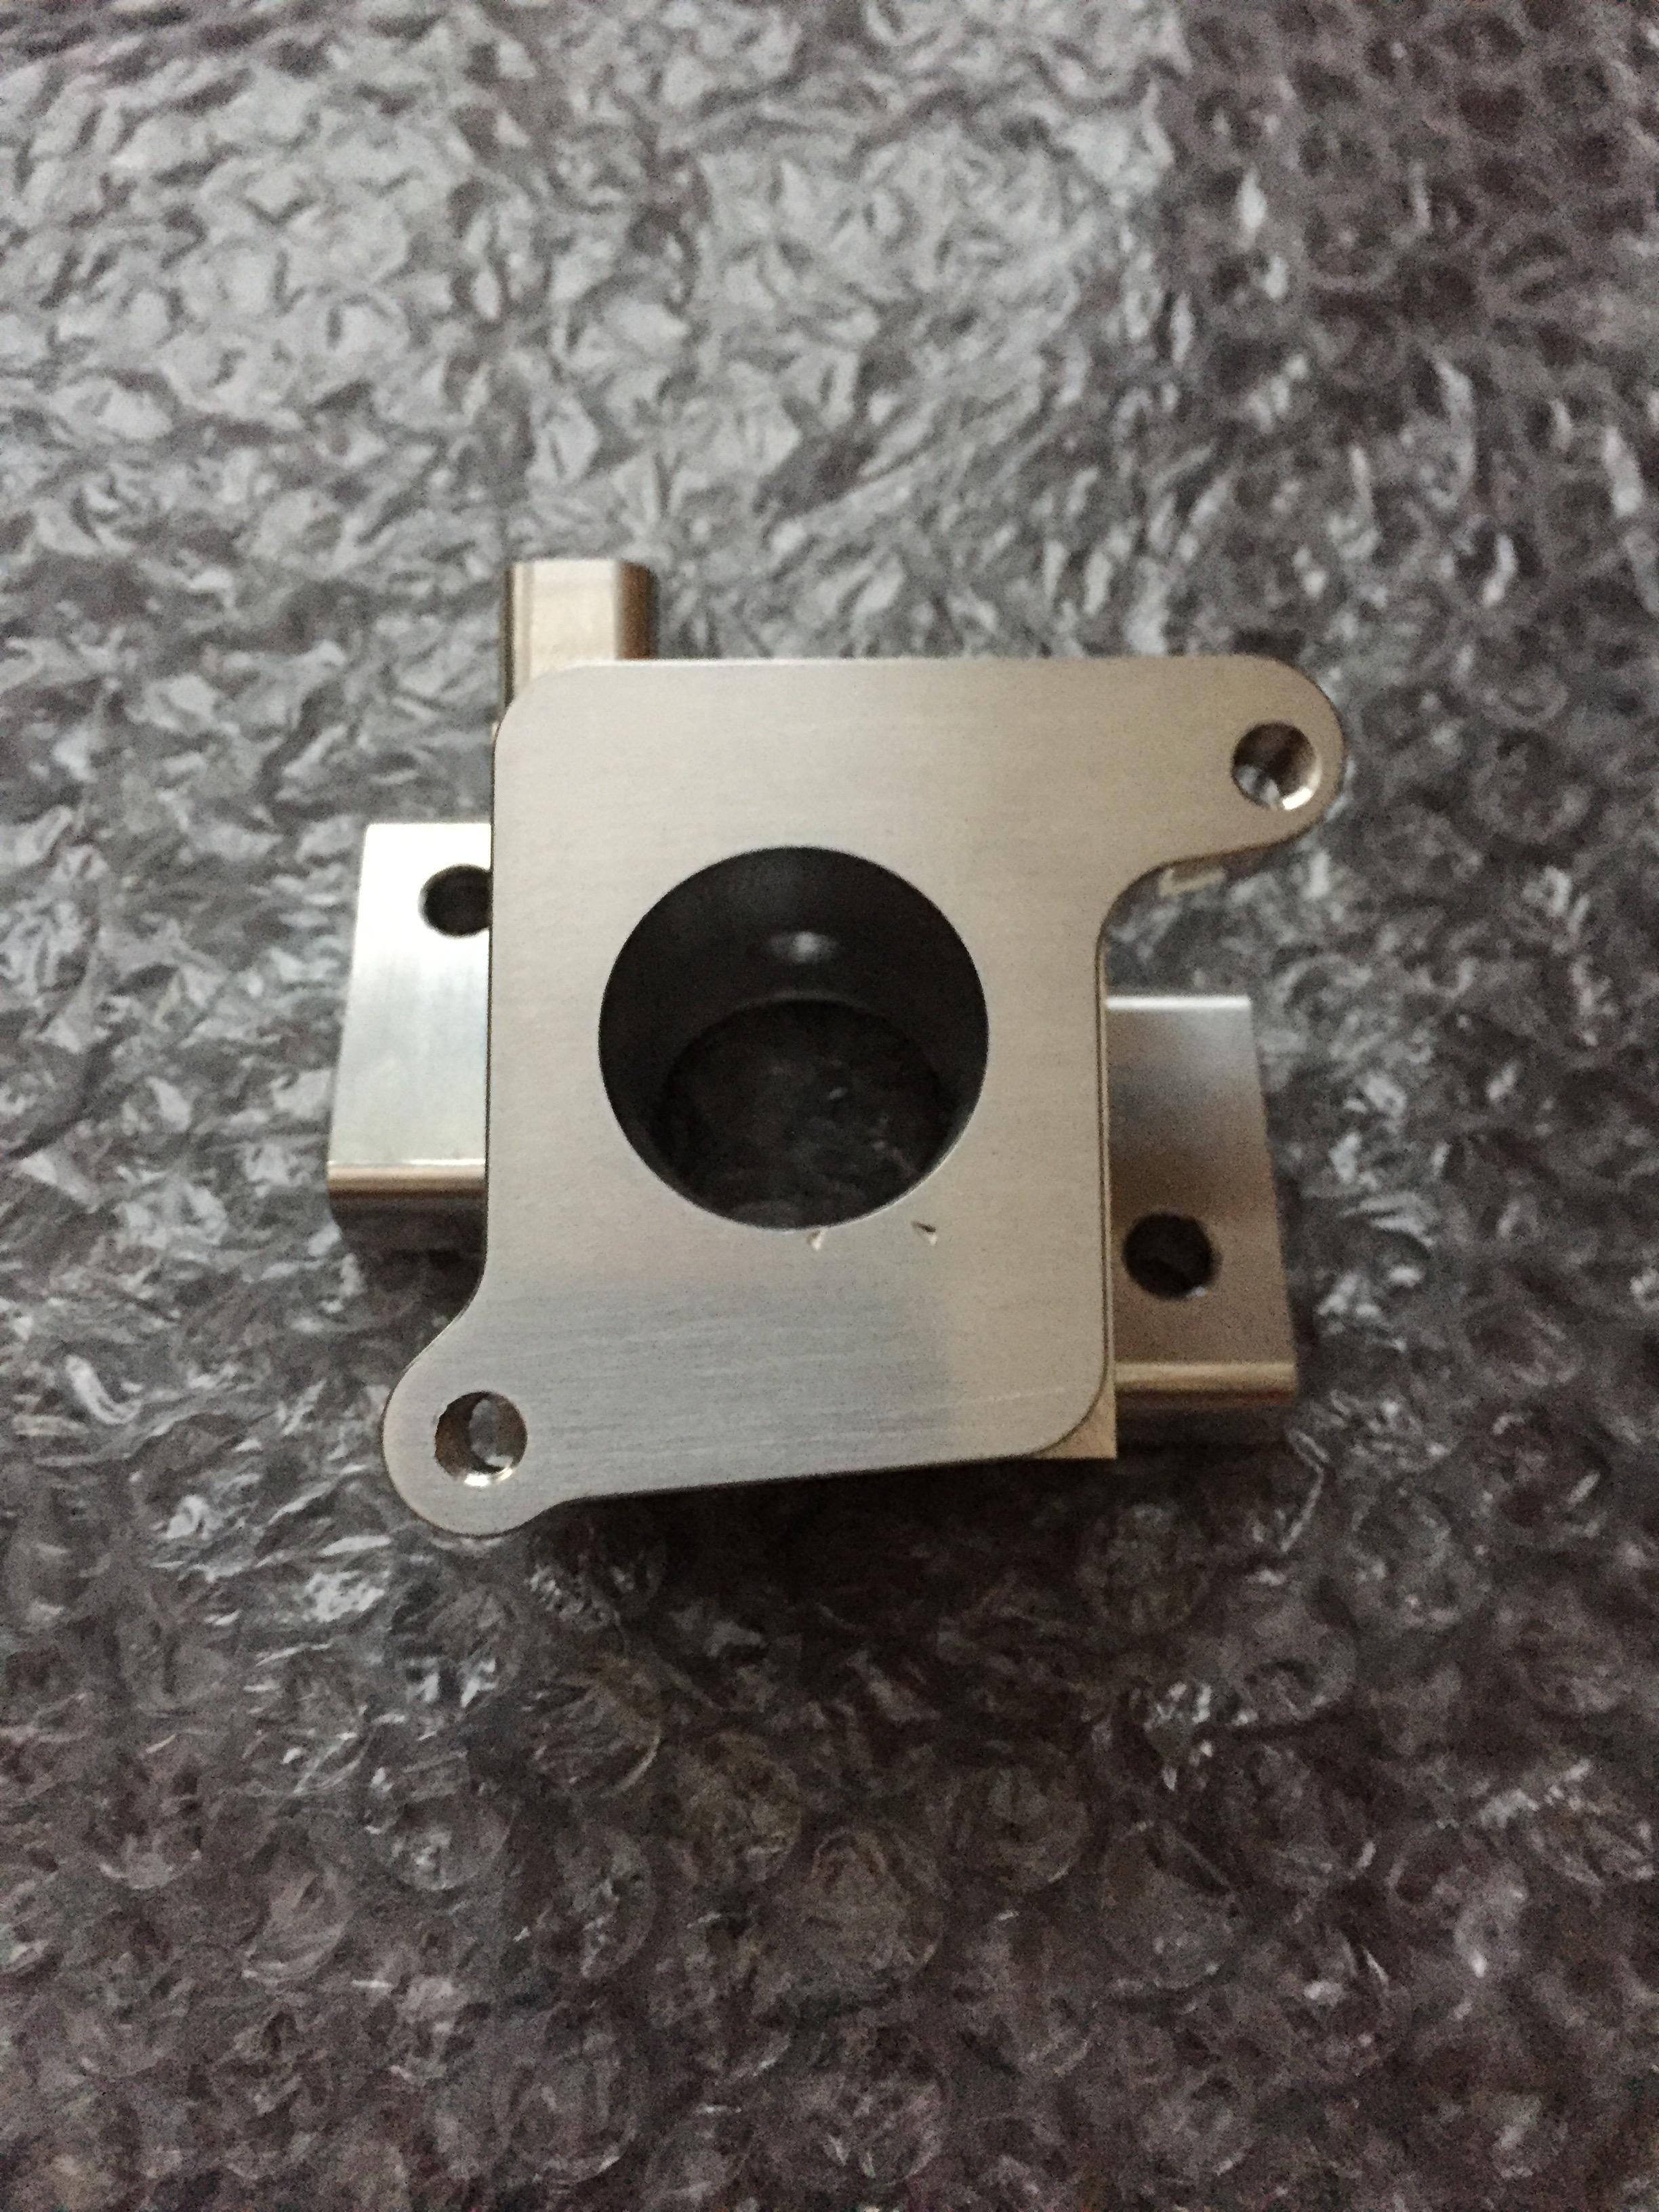 For Sale To UK: Grom Fatherz Rev Wedge - Stock Throttle Body size-c576b5d2-68f5-4843-b9db-69b3f5c8cb95_1567793716175.jpeg